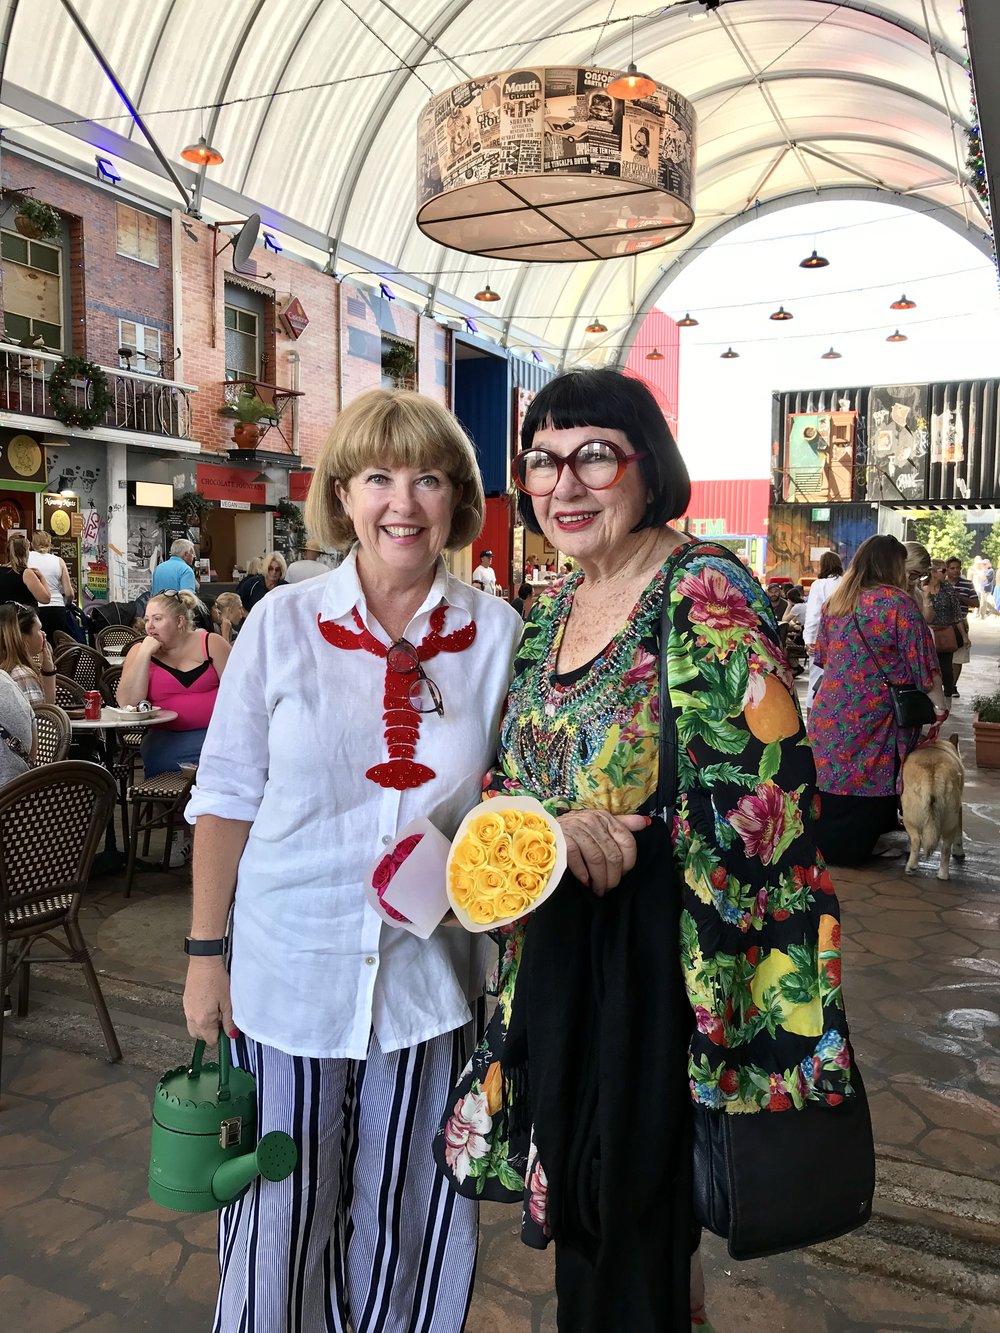 Jacki MacDonald and Peter Hackworth - Successful Ladies of Eat Street